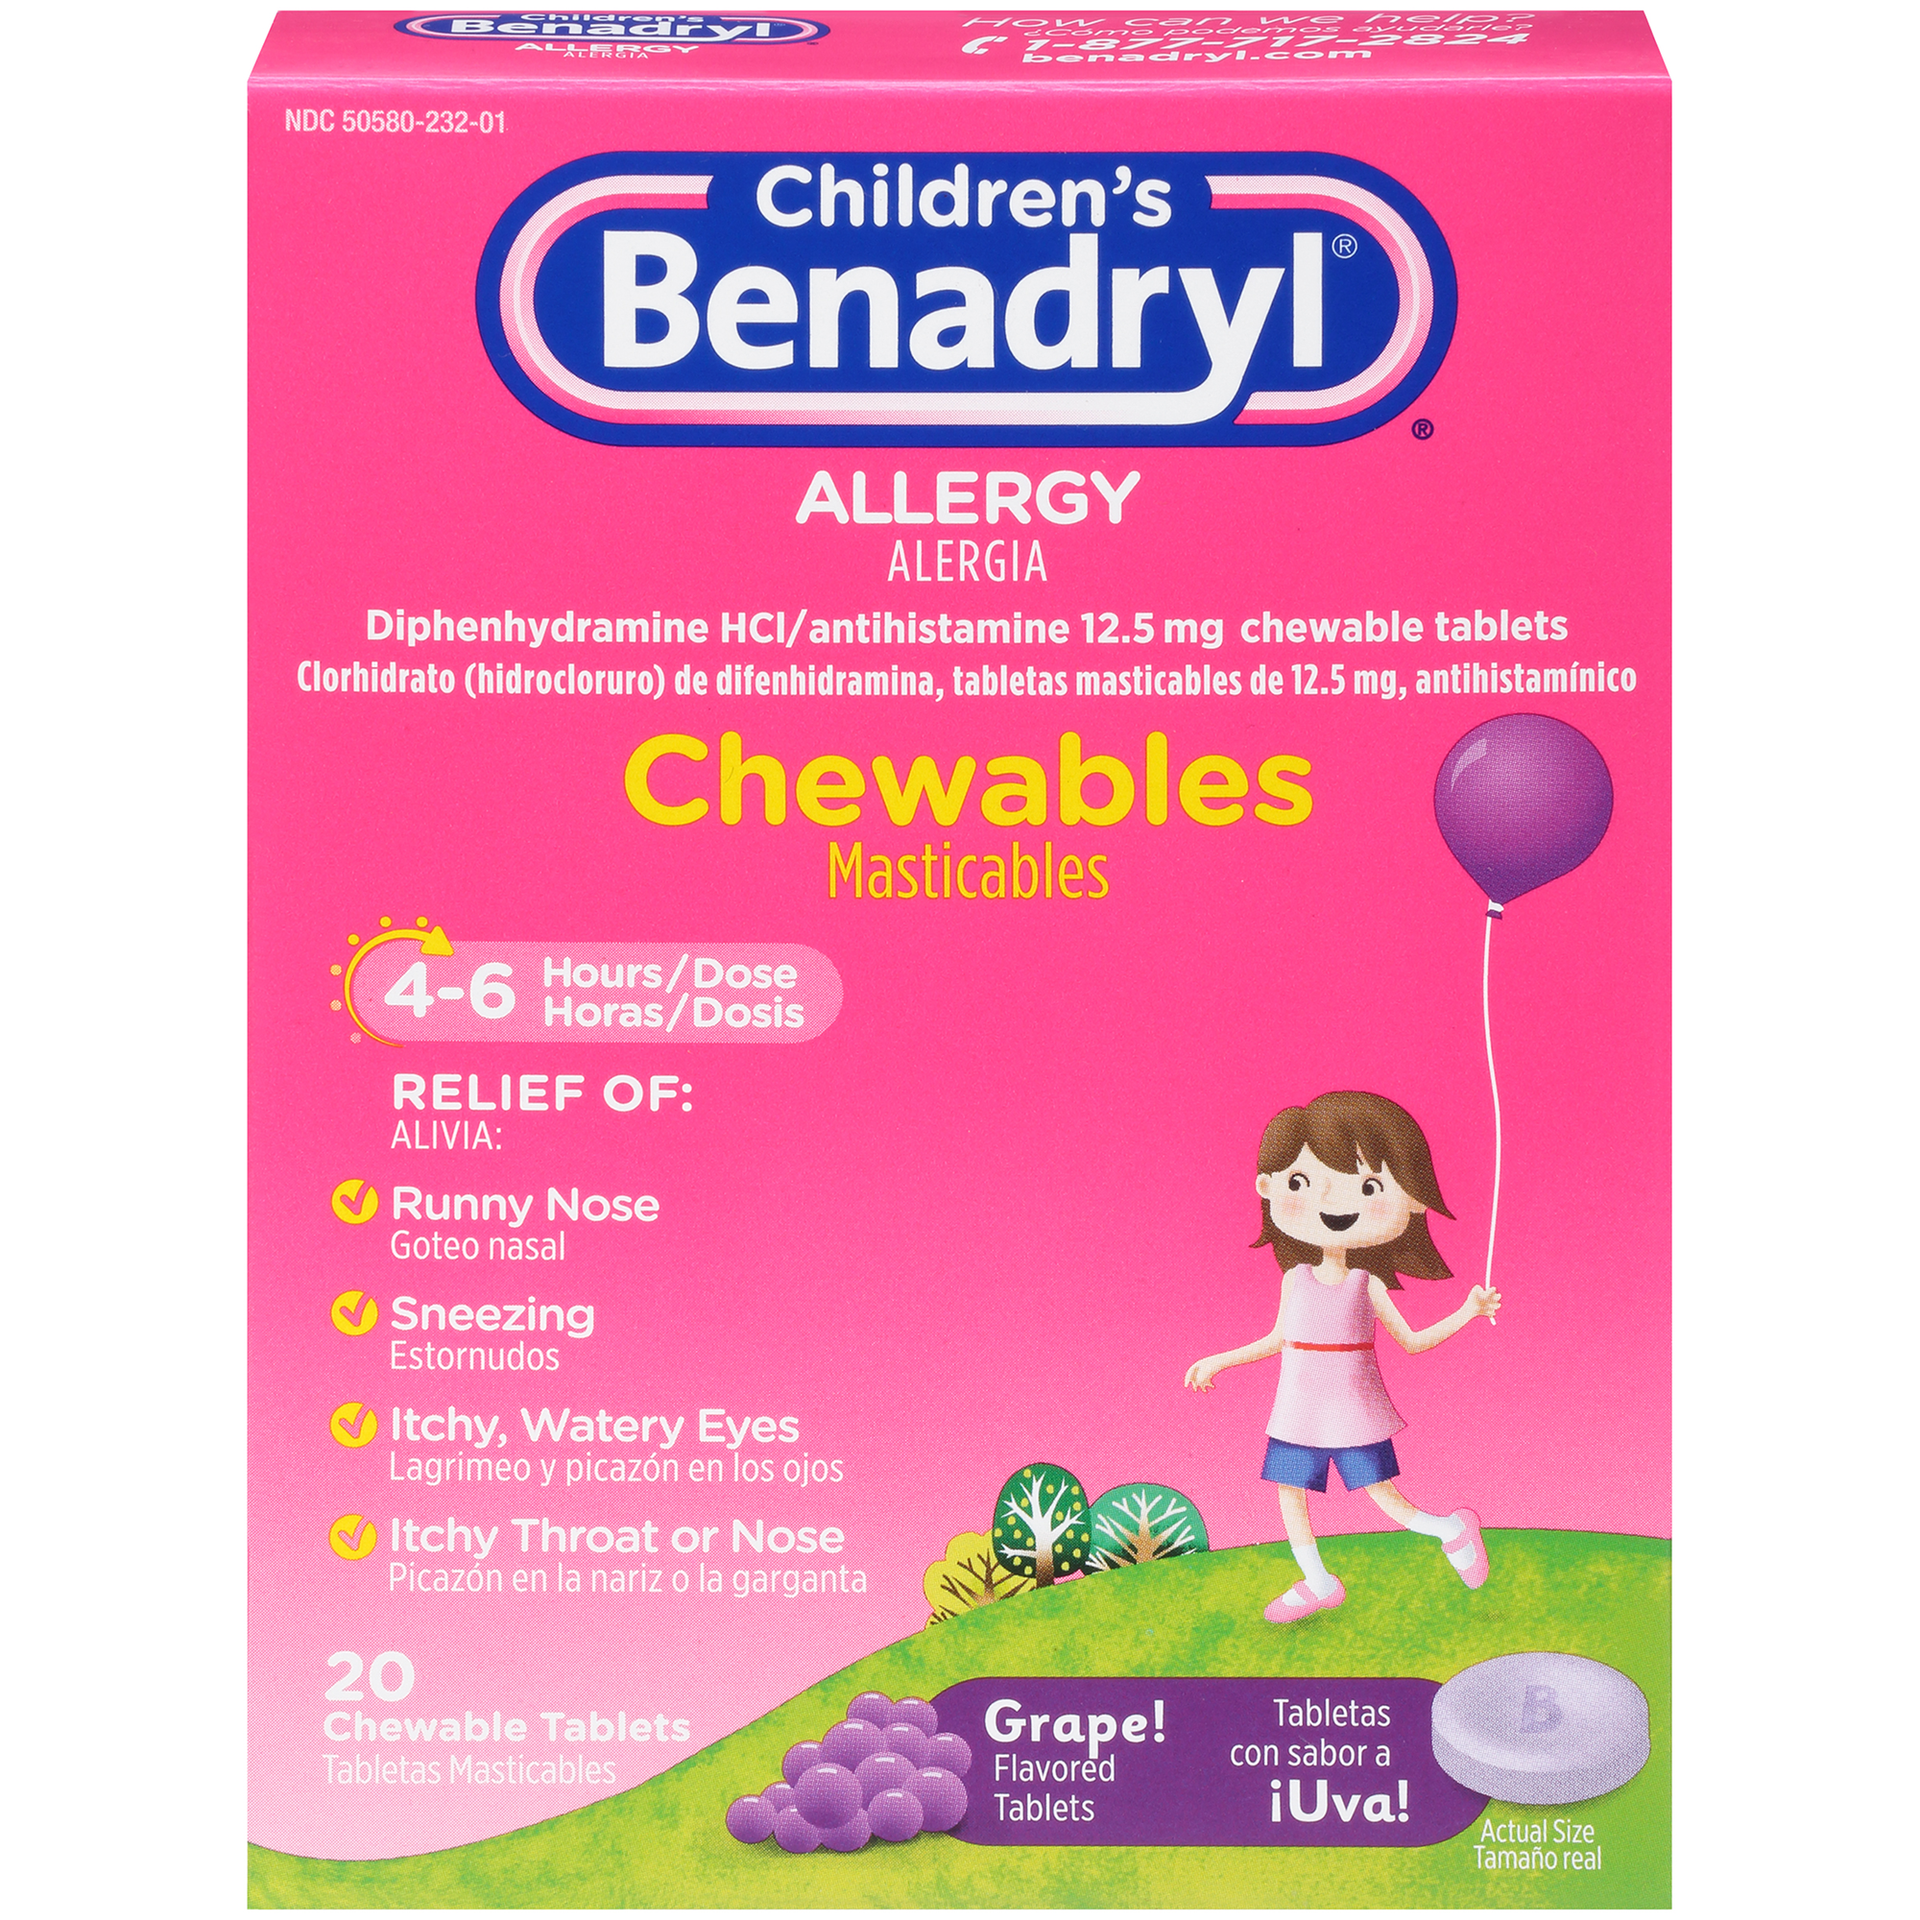 Children's Benadryl Allergy Chewable Tablets, Grape Flavor, 20 CT.